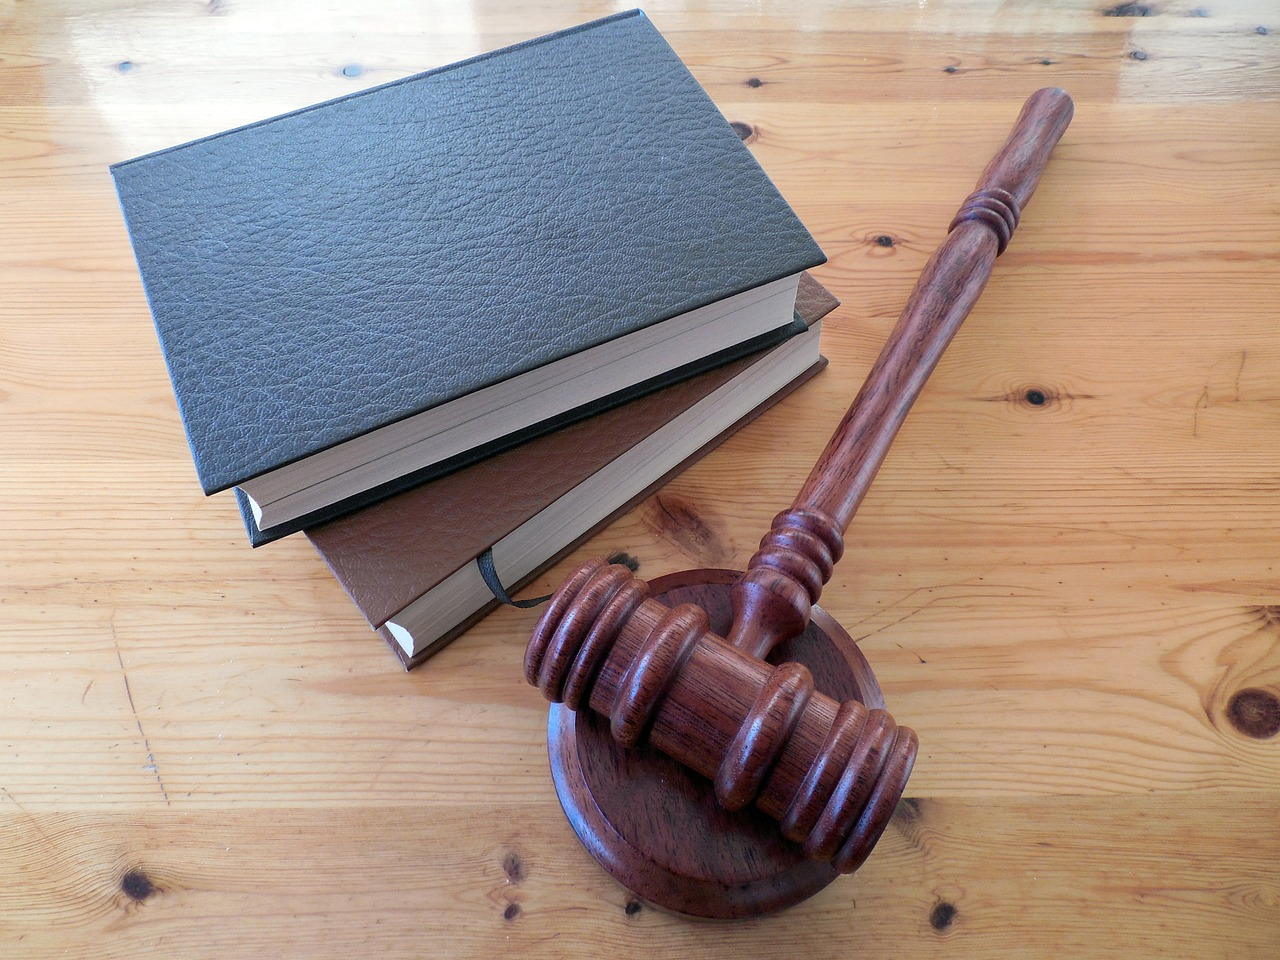 Как не заплатить юристу: ООО «Виста» сдала назад в суде